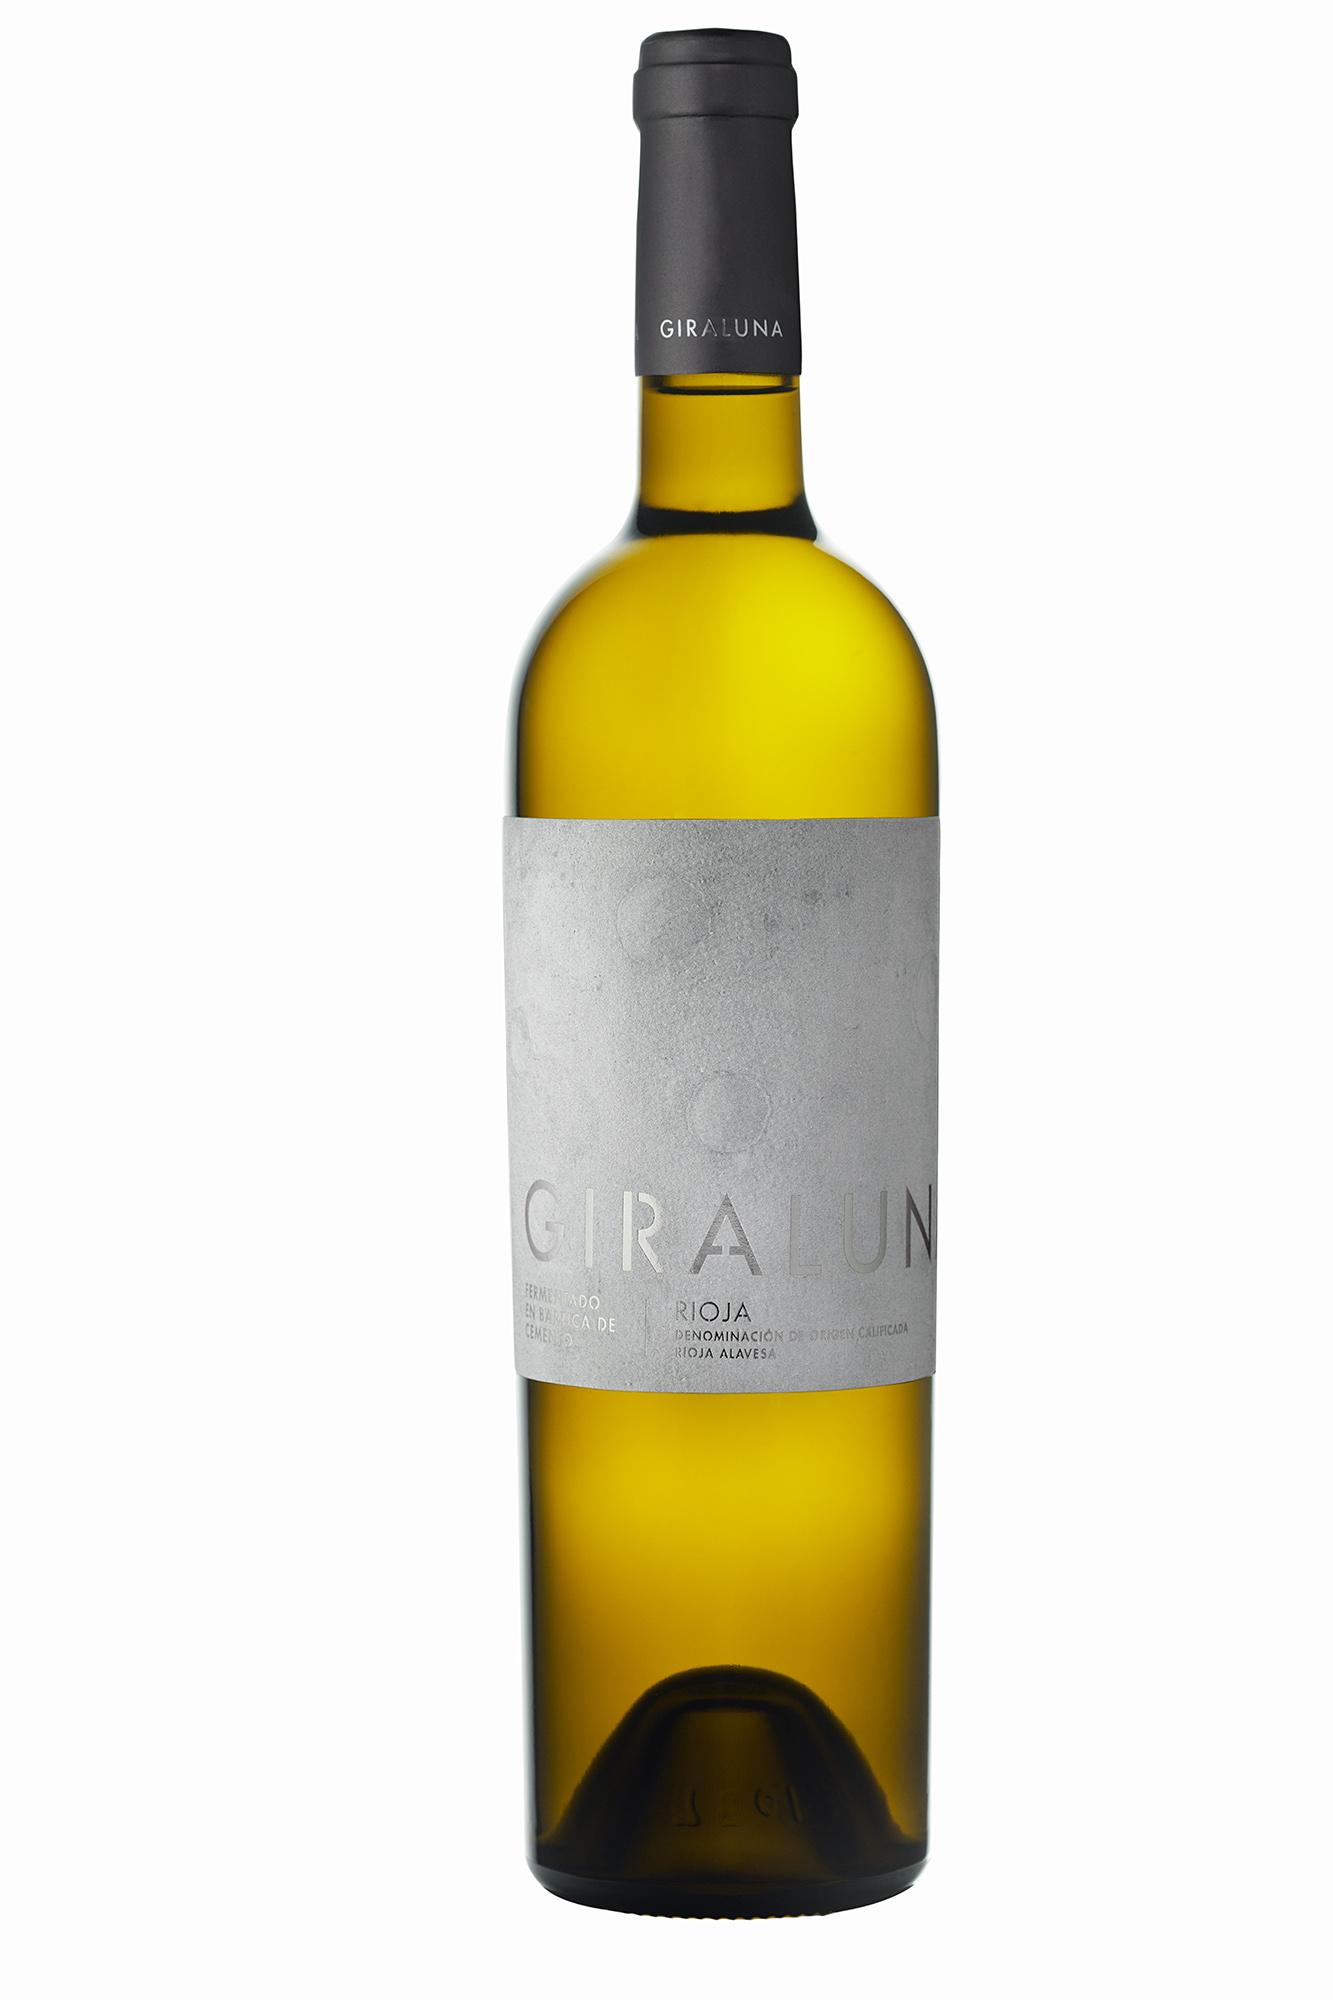 GIRALUNA RELATO DE VALIENTES covilka vino wine fotografia photography advertising publicidad rioja Alavesa vitoria Gasteiz wine botella